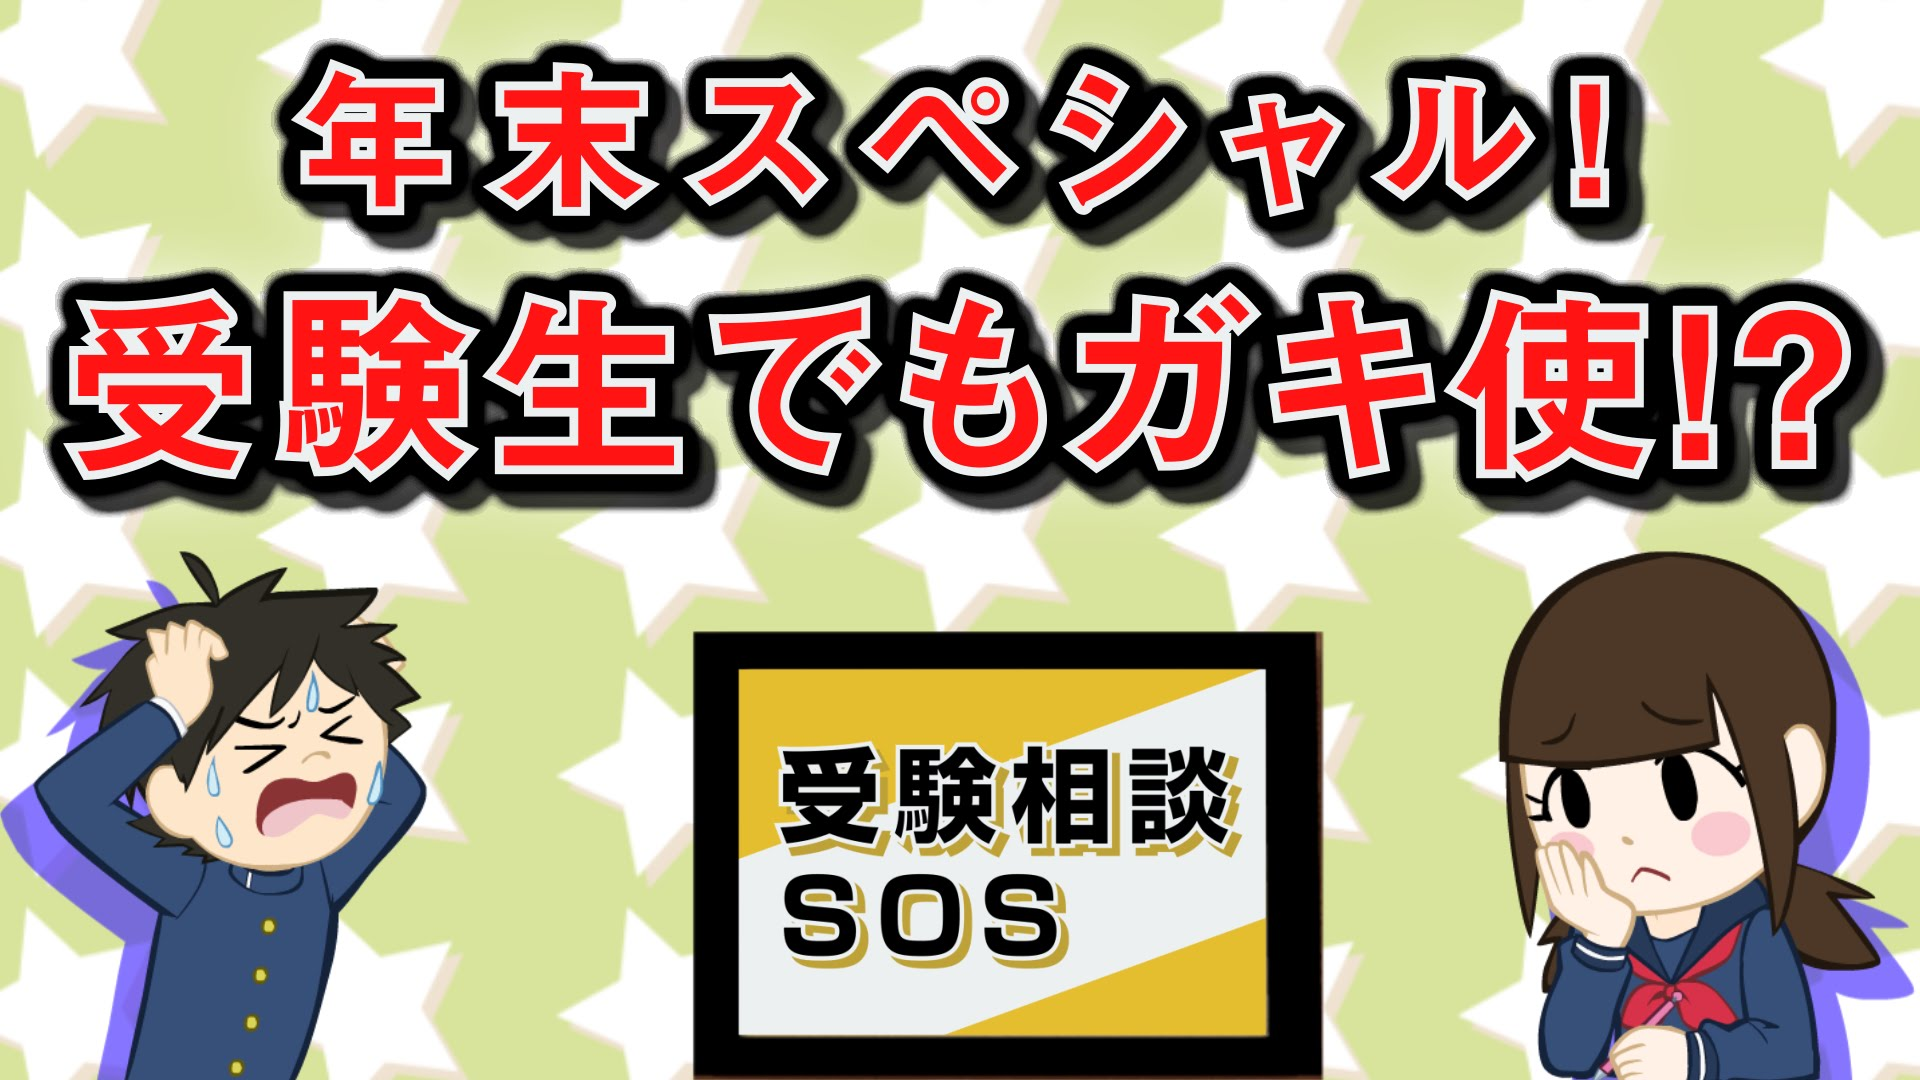 【vol.38】年末スペシャル!受験生でもガキ使!?|受験相談SOS